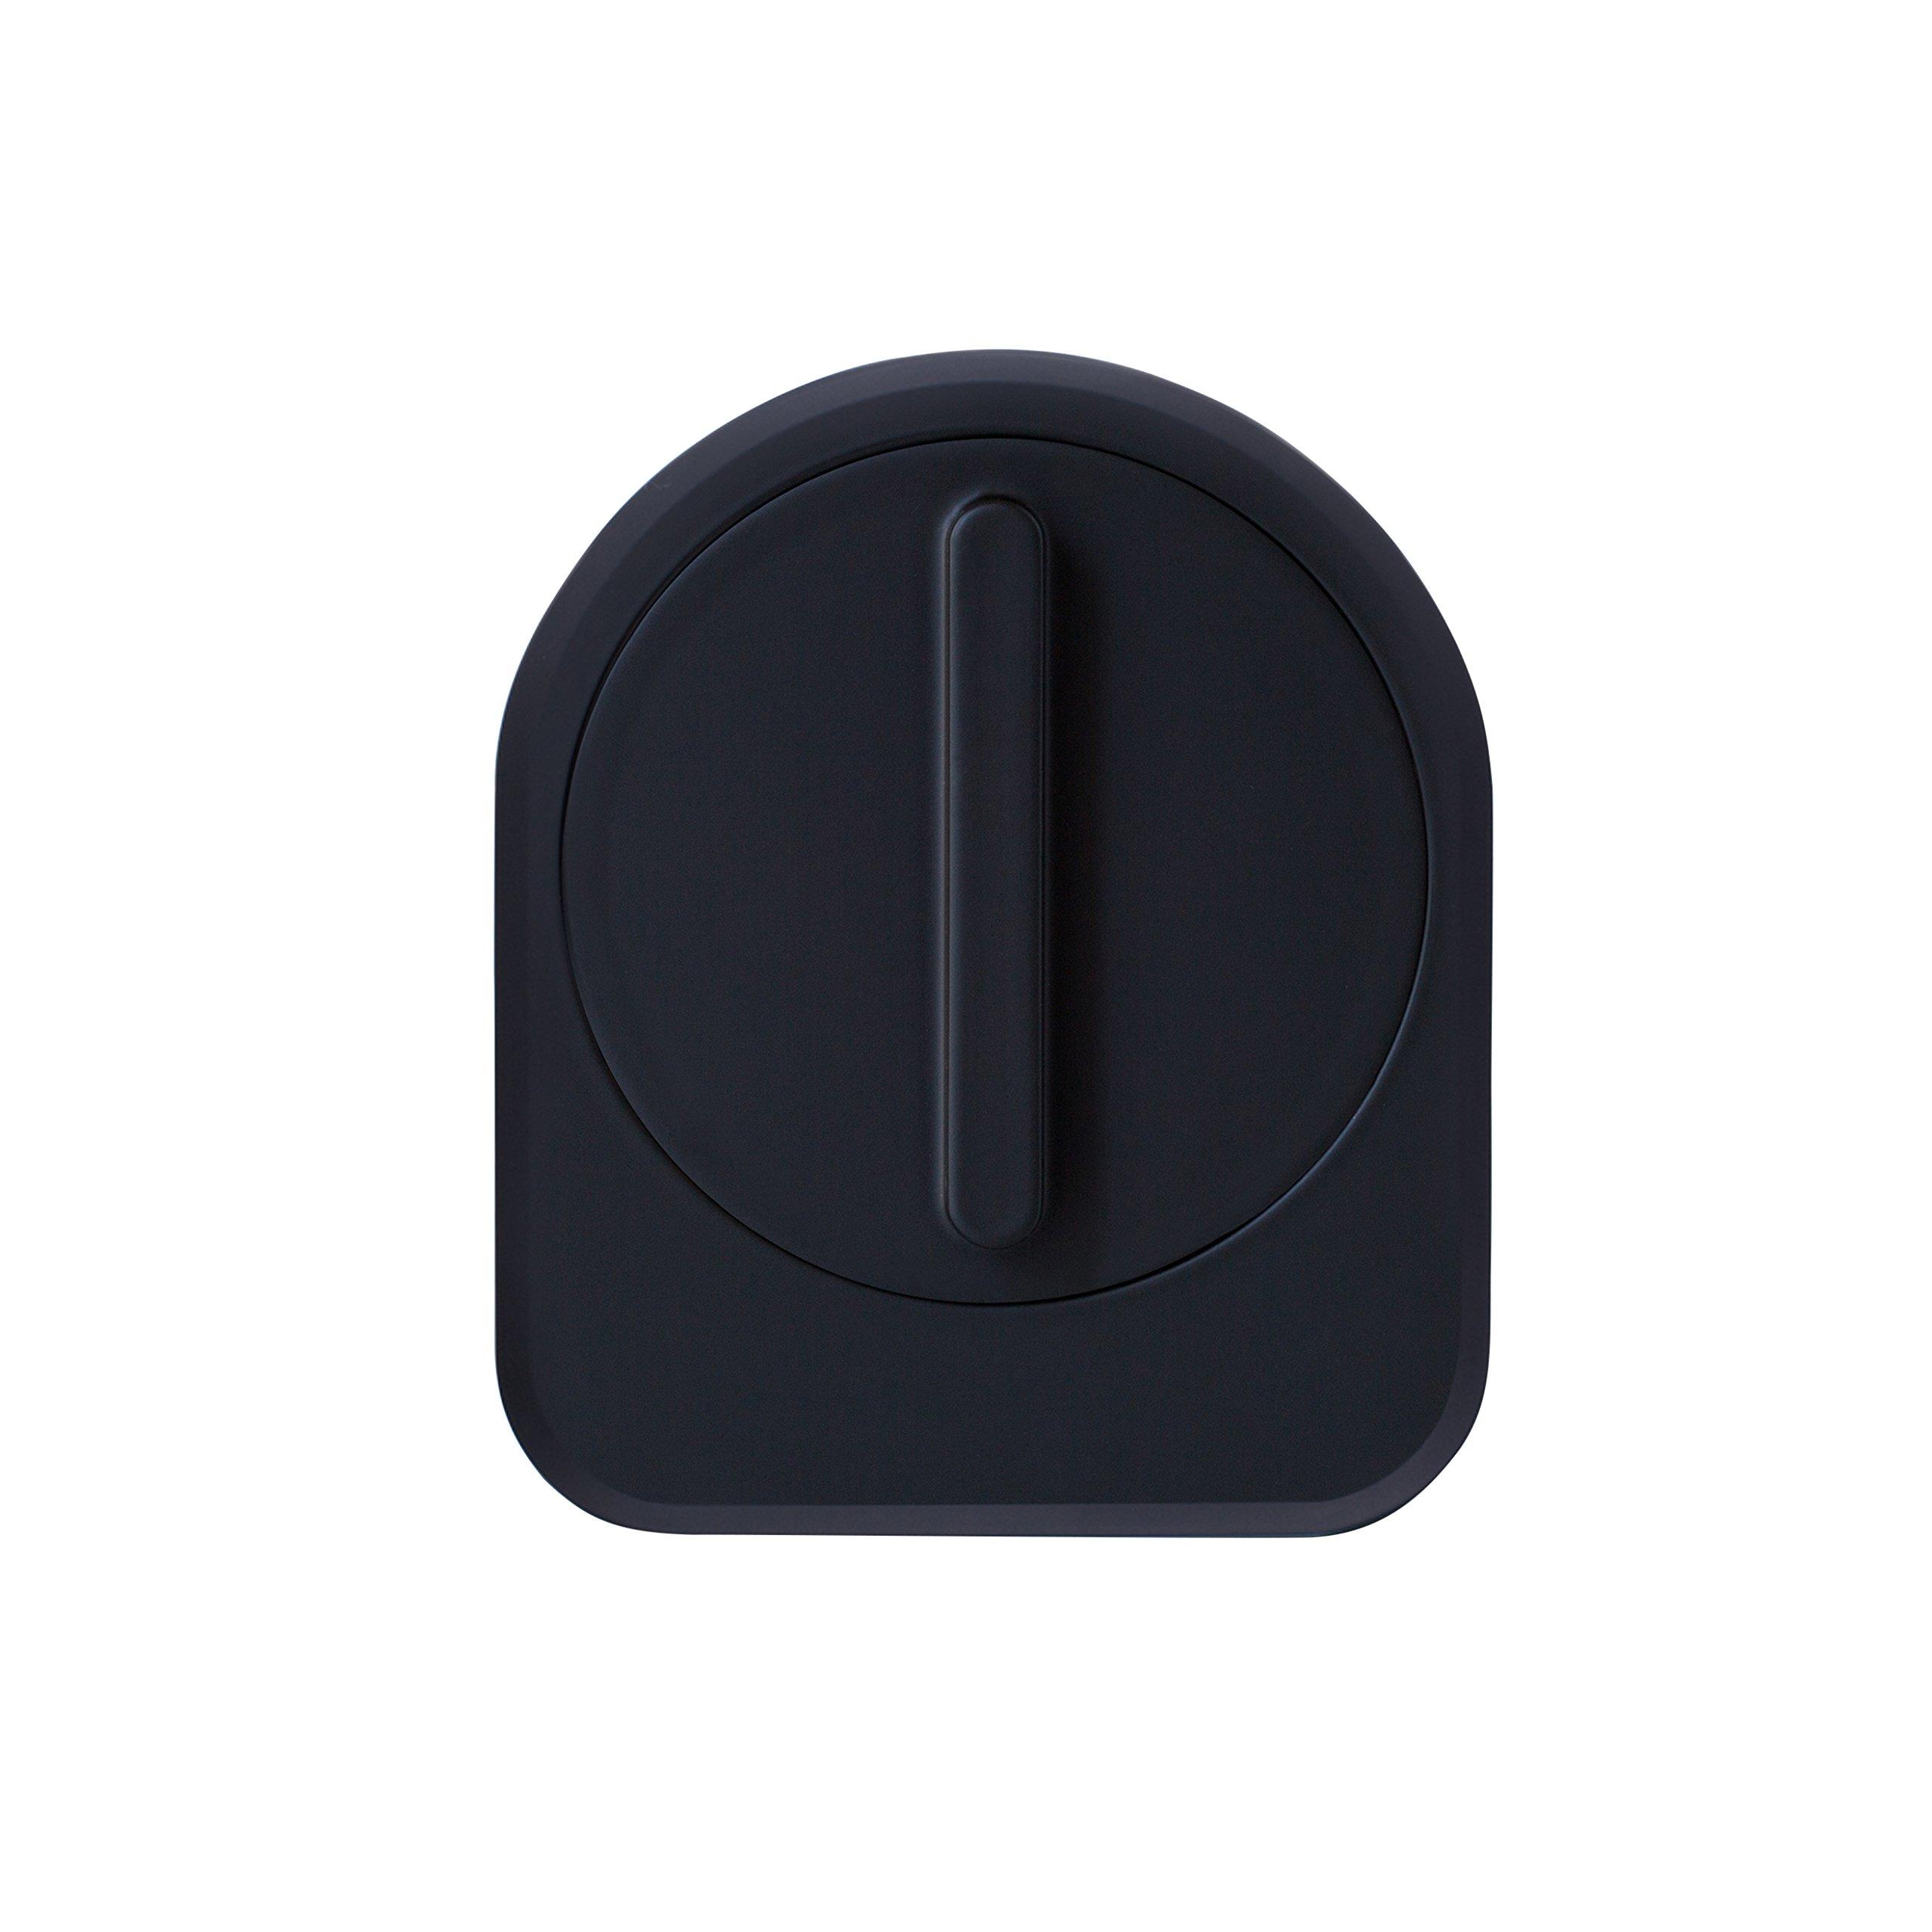 Sesame Smart Lock, Google Home, Amazon Alexa, IFTTT enabled Gen 2 Matte Black